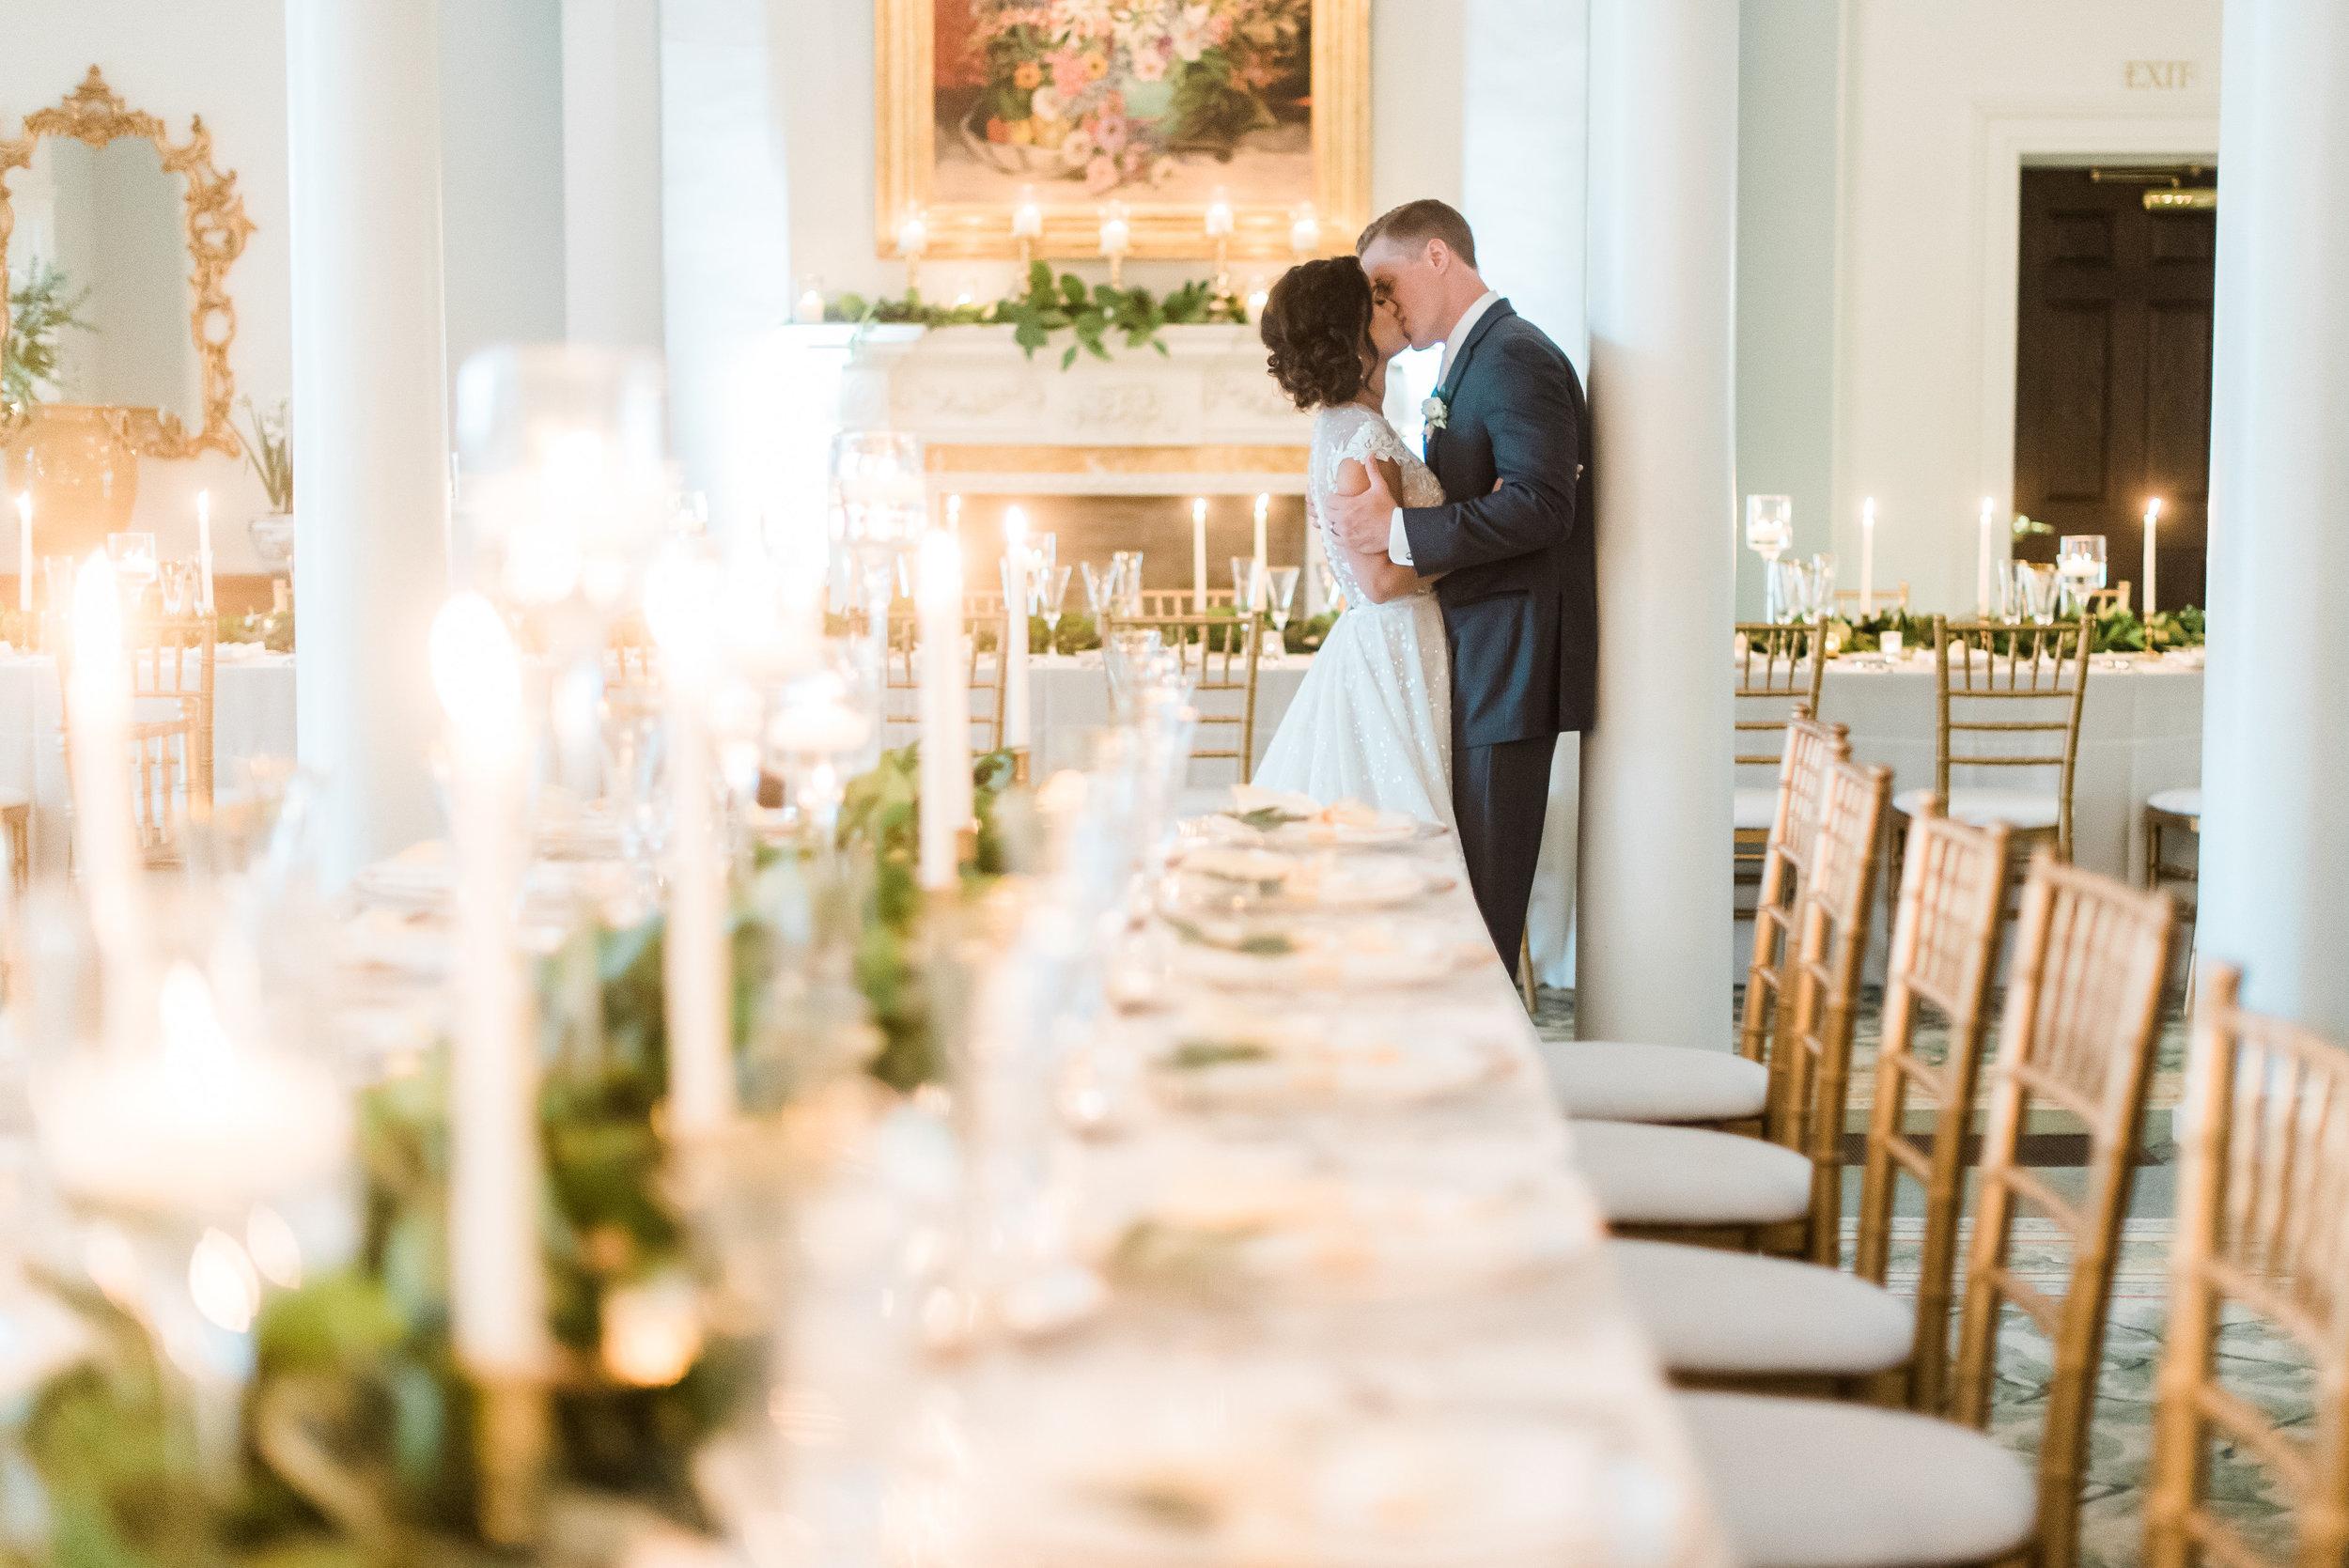 pittsburgh-wedding-photographer-classic-greenery-foxchapelgolfclub0029.jpg